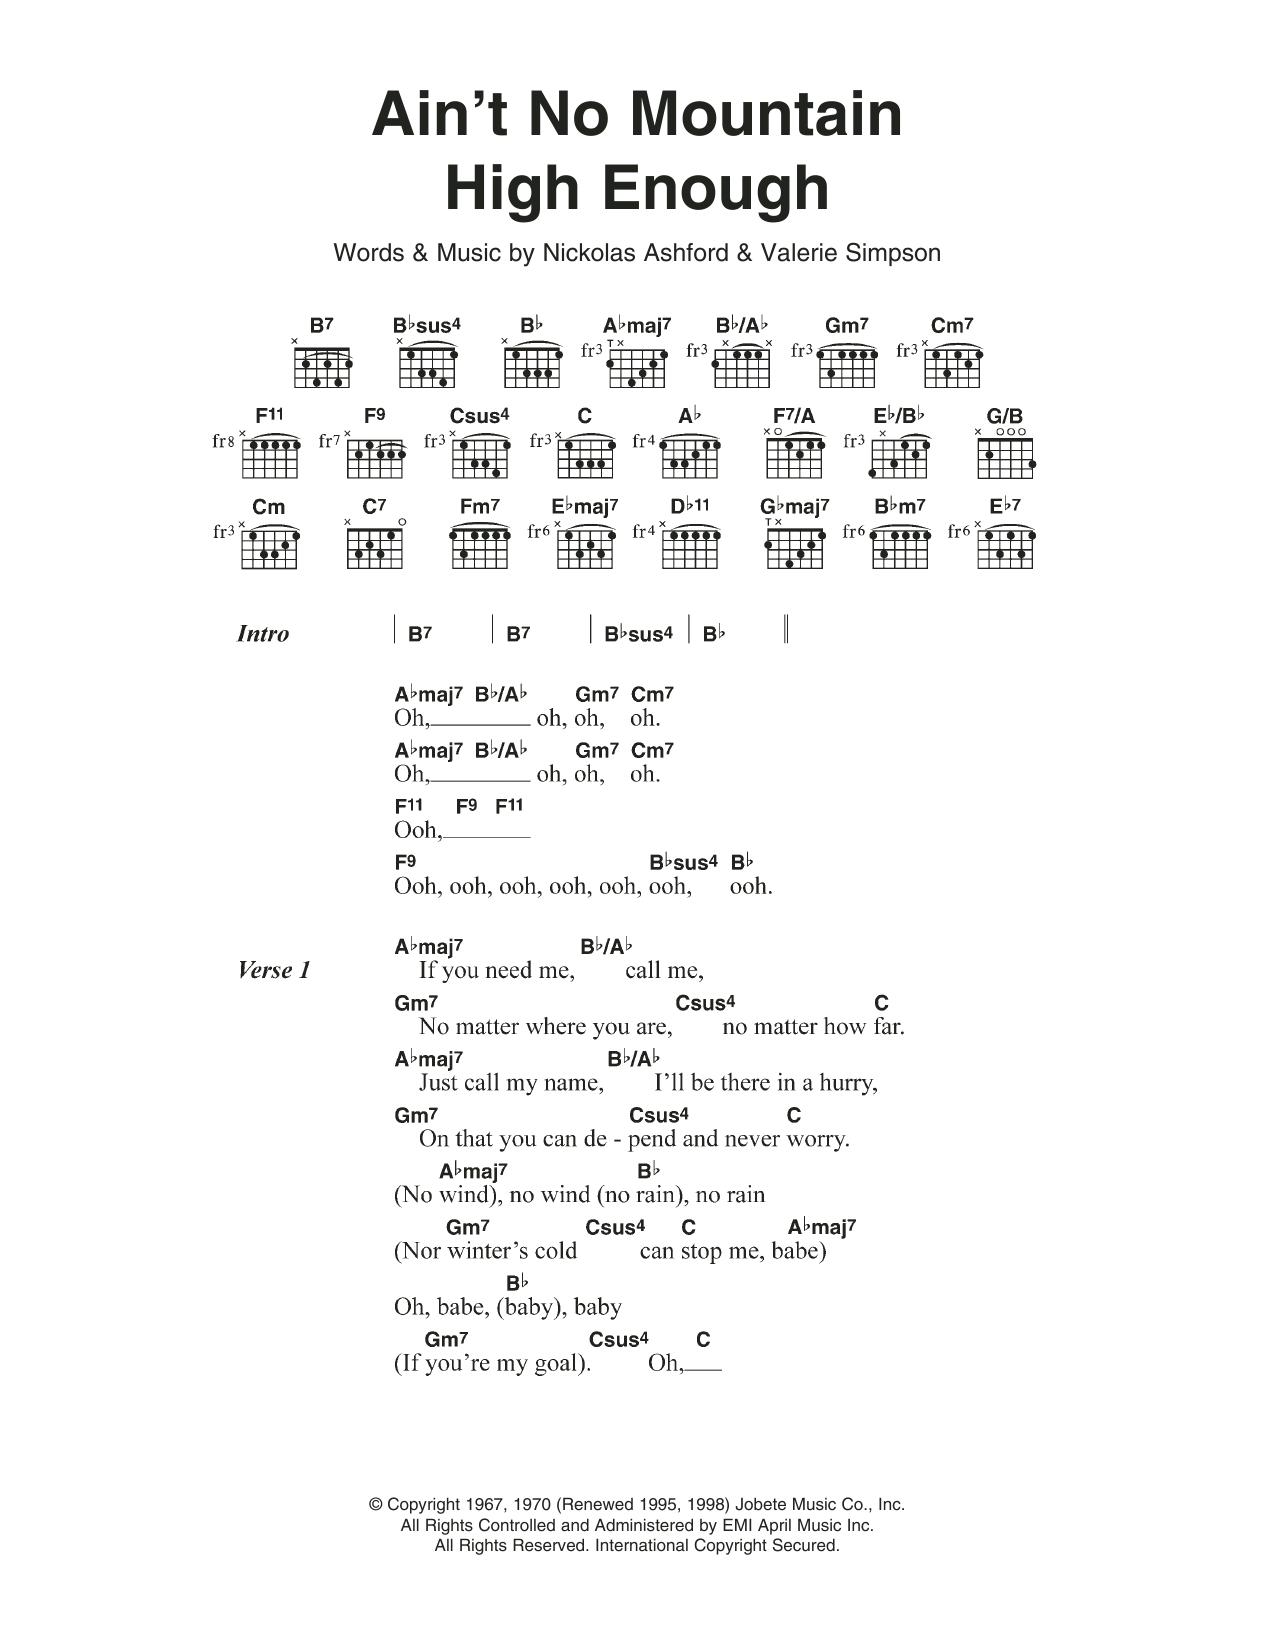 Ain T No Sunshine Chords Aint No Mountain High Enough Diana Ross Piano Vocal Guitar Right Hand Melody Digital Sheet Music